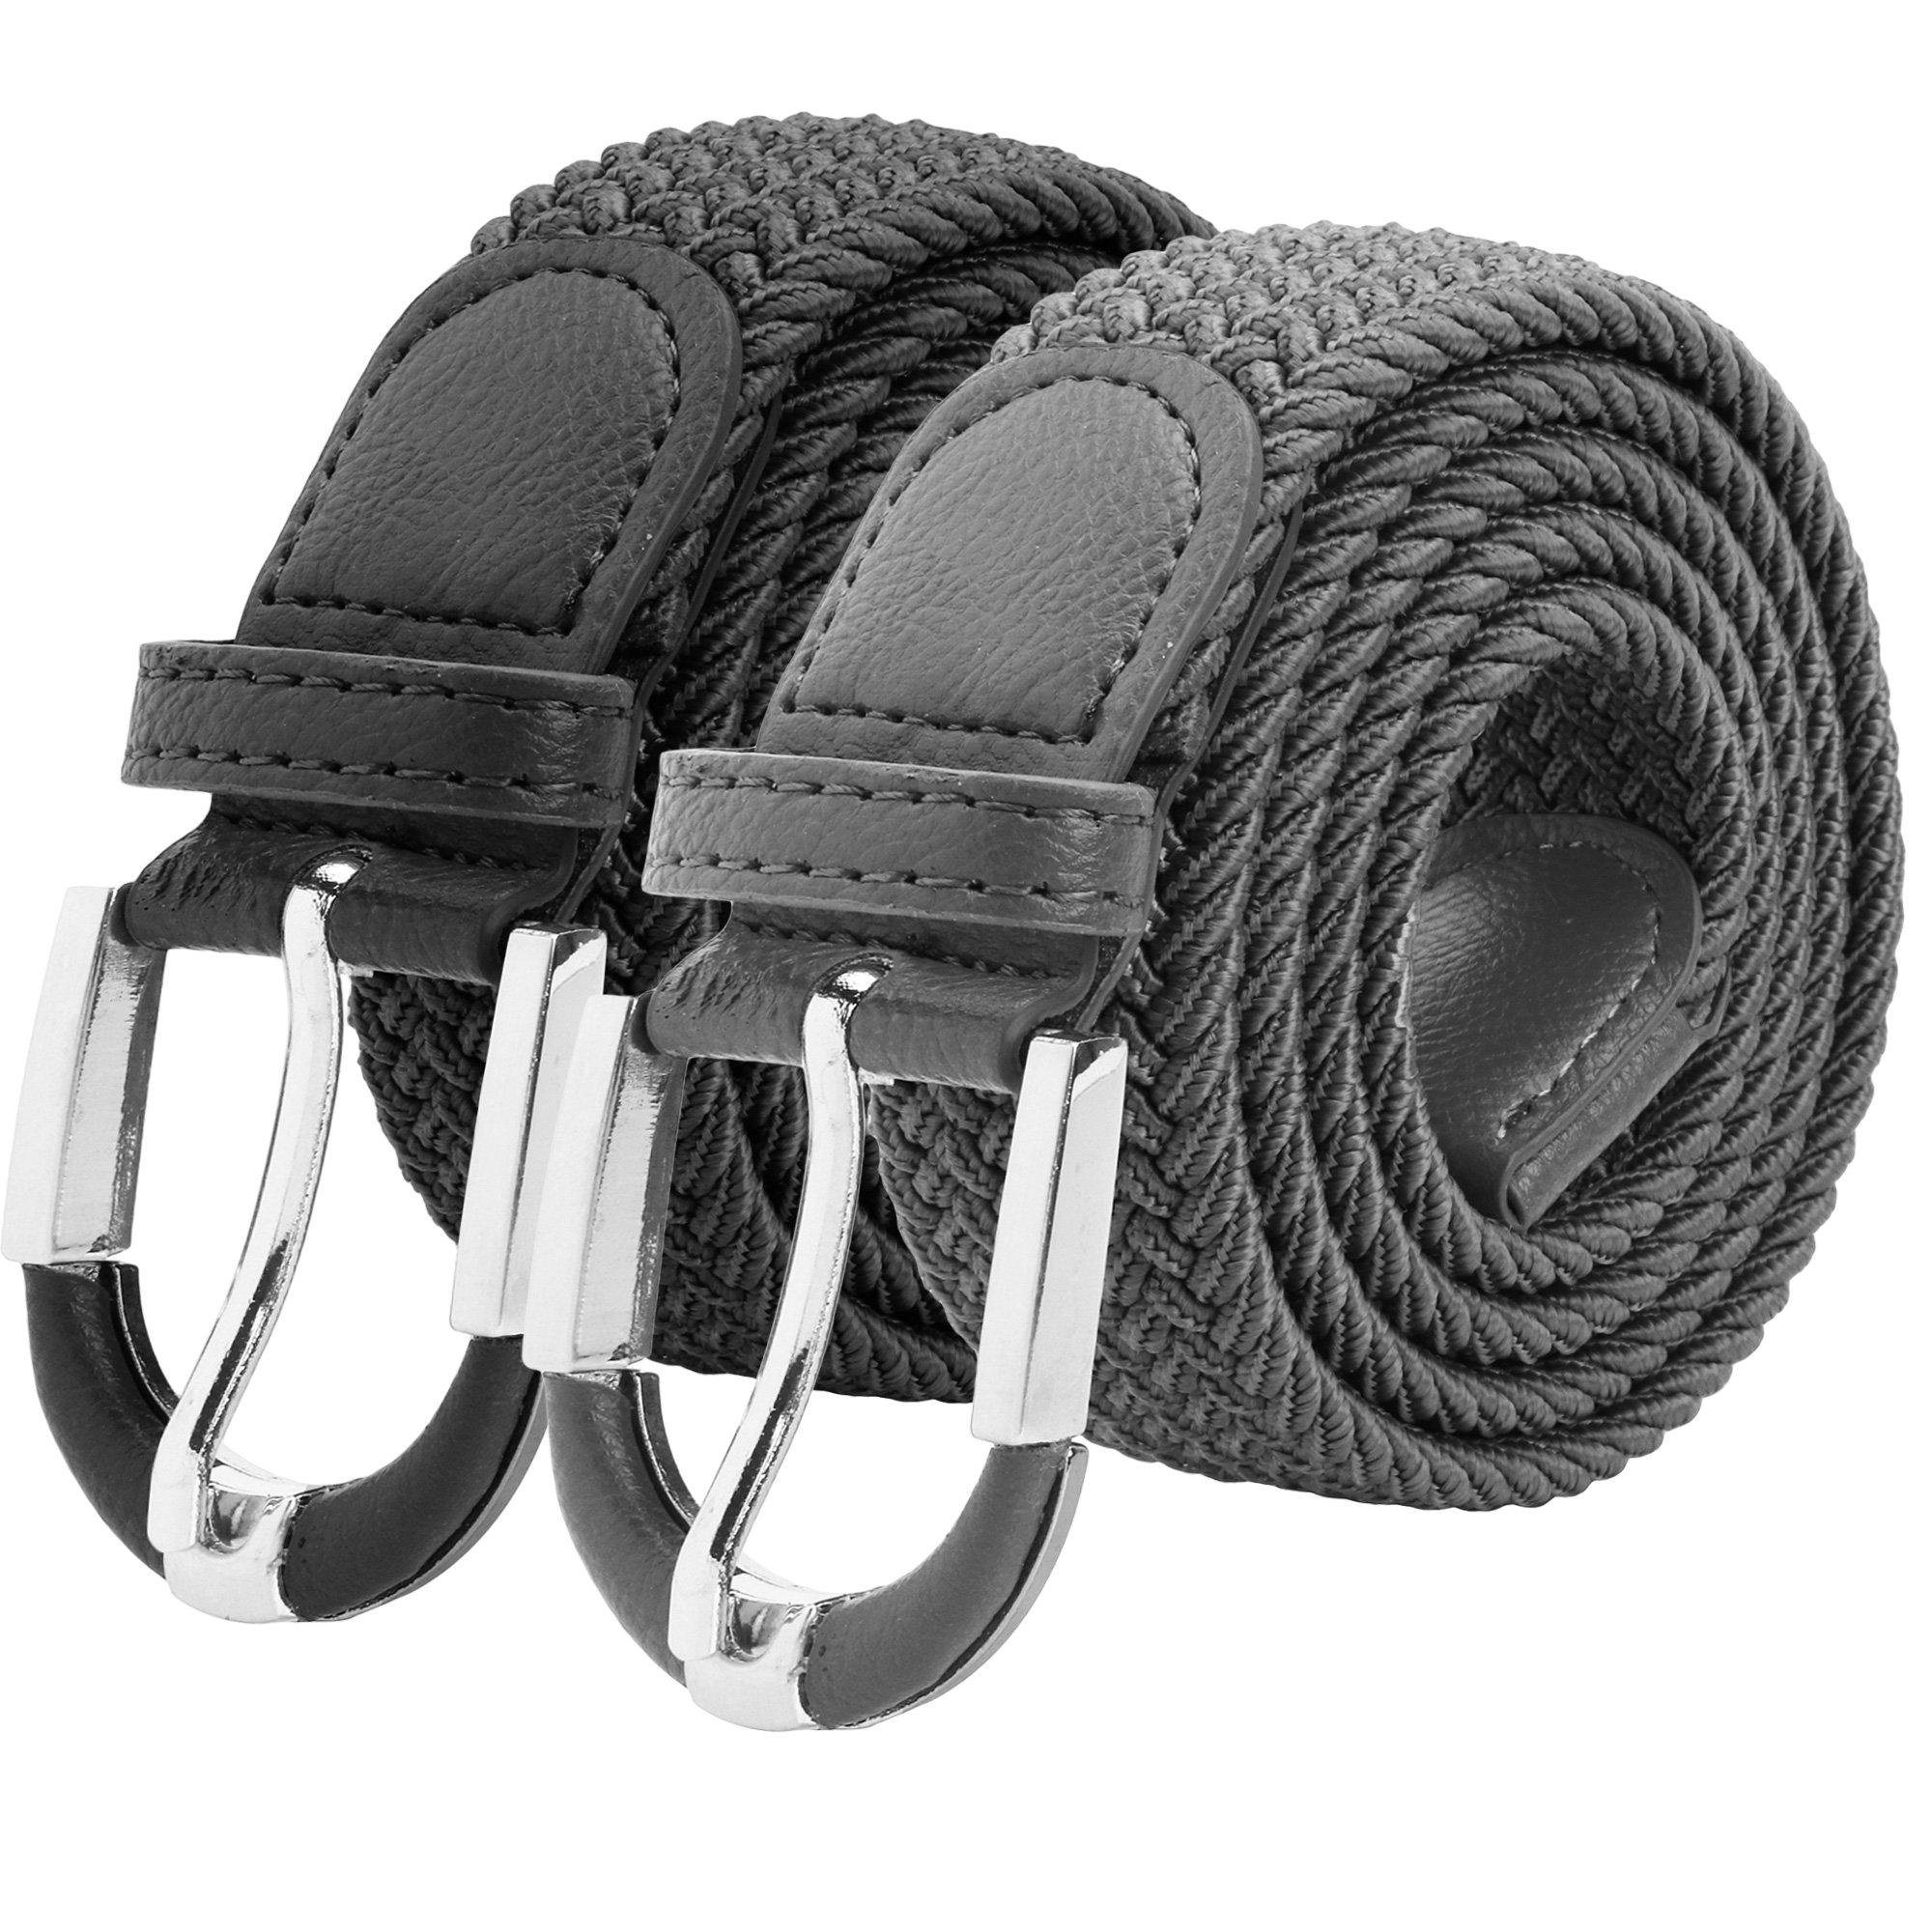 Falari Unisex Braided Elastic Stretch Belt Casual Weave Canvas Fabric Woven Belt 1001-BLKGRY-L